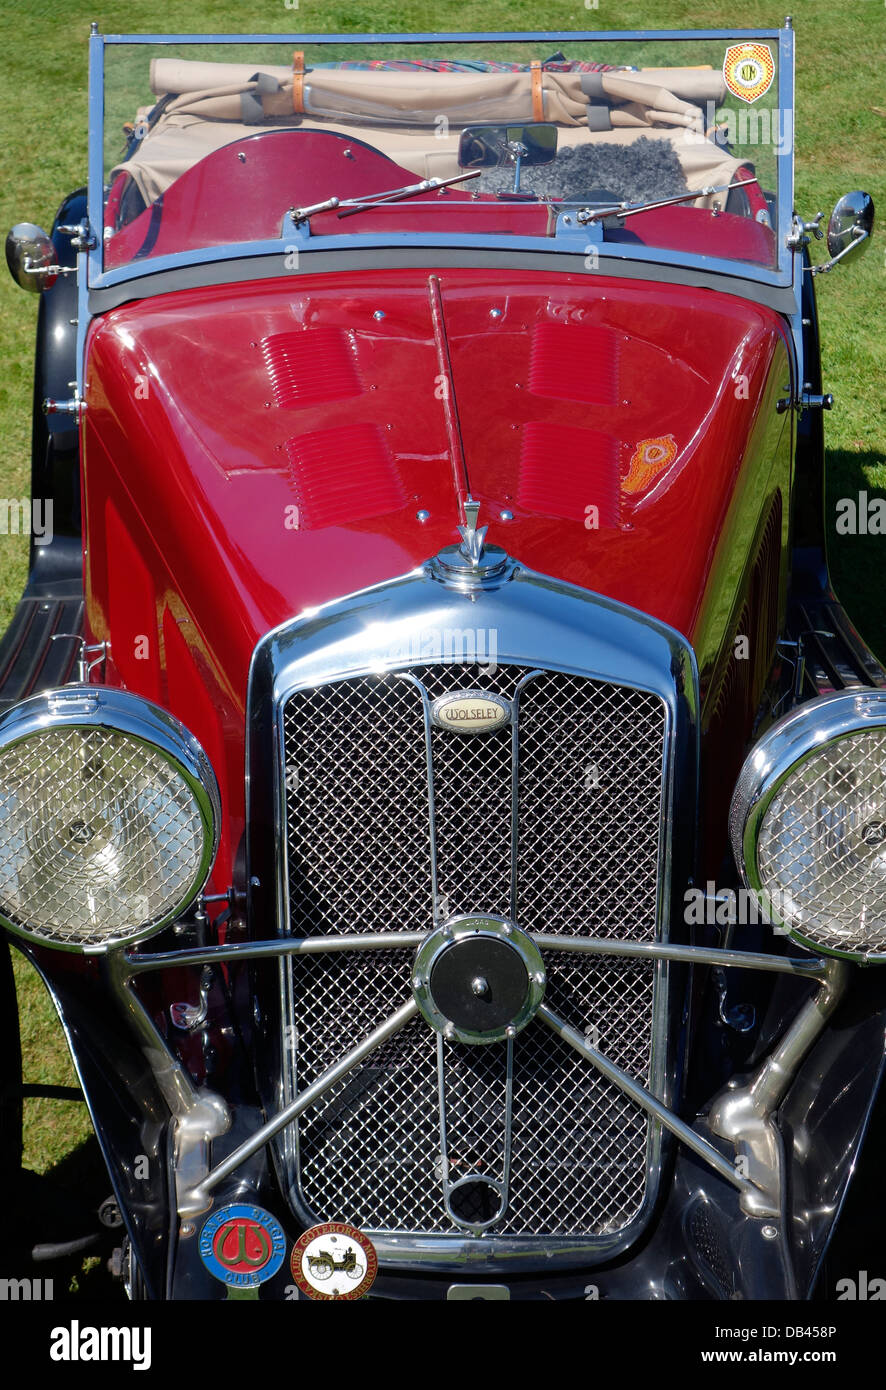 Vista frontal de un antiguo automóvil Wolseley Hornet especial Imagen De Stock